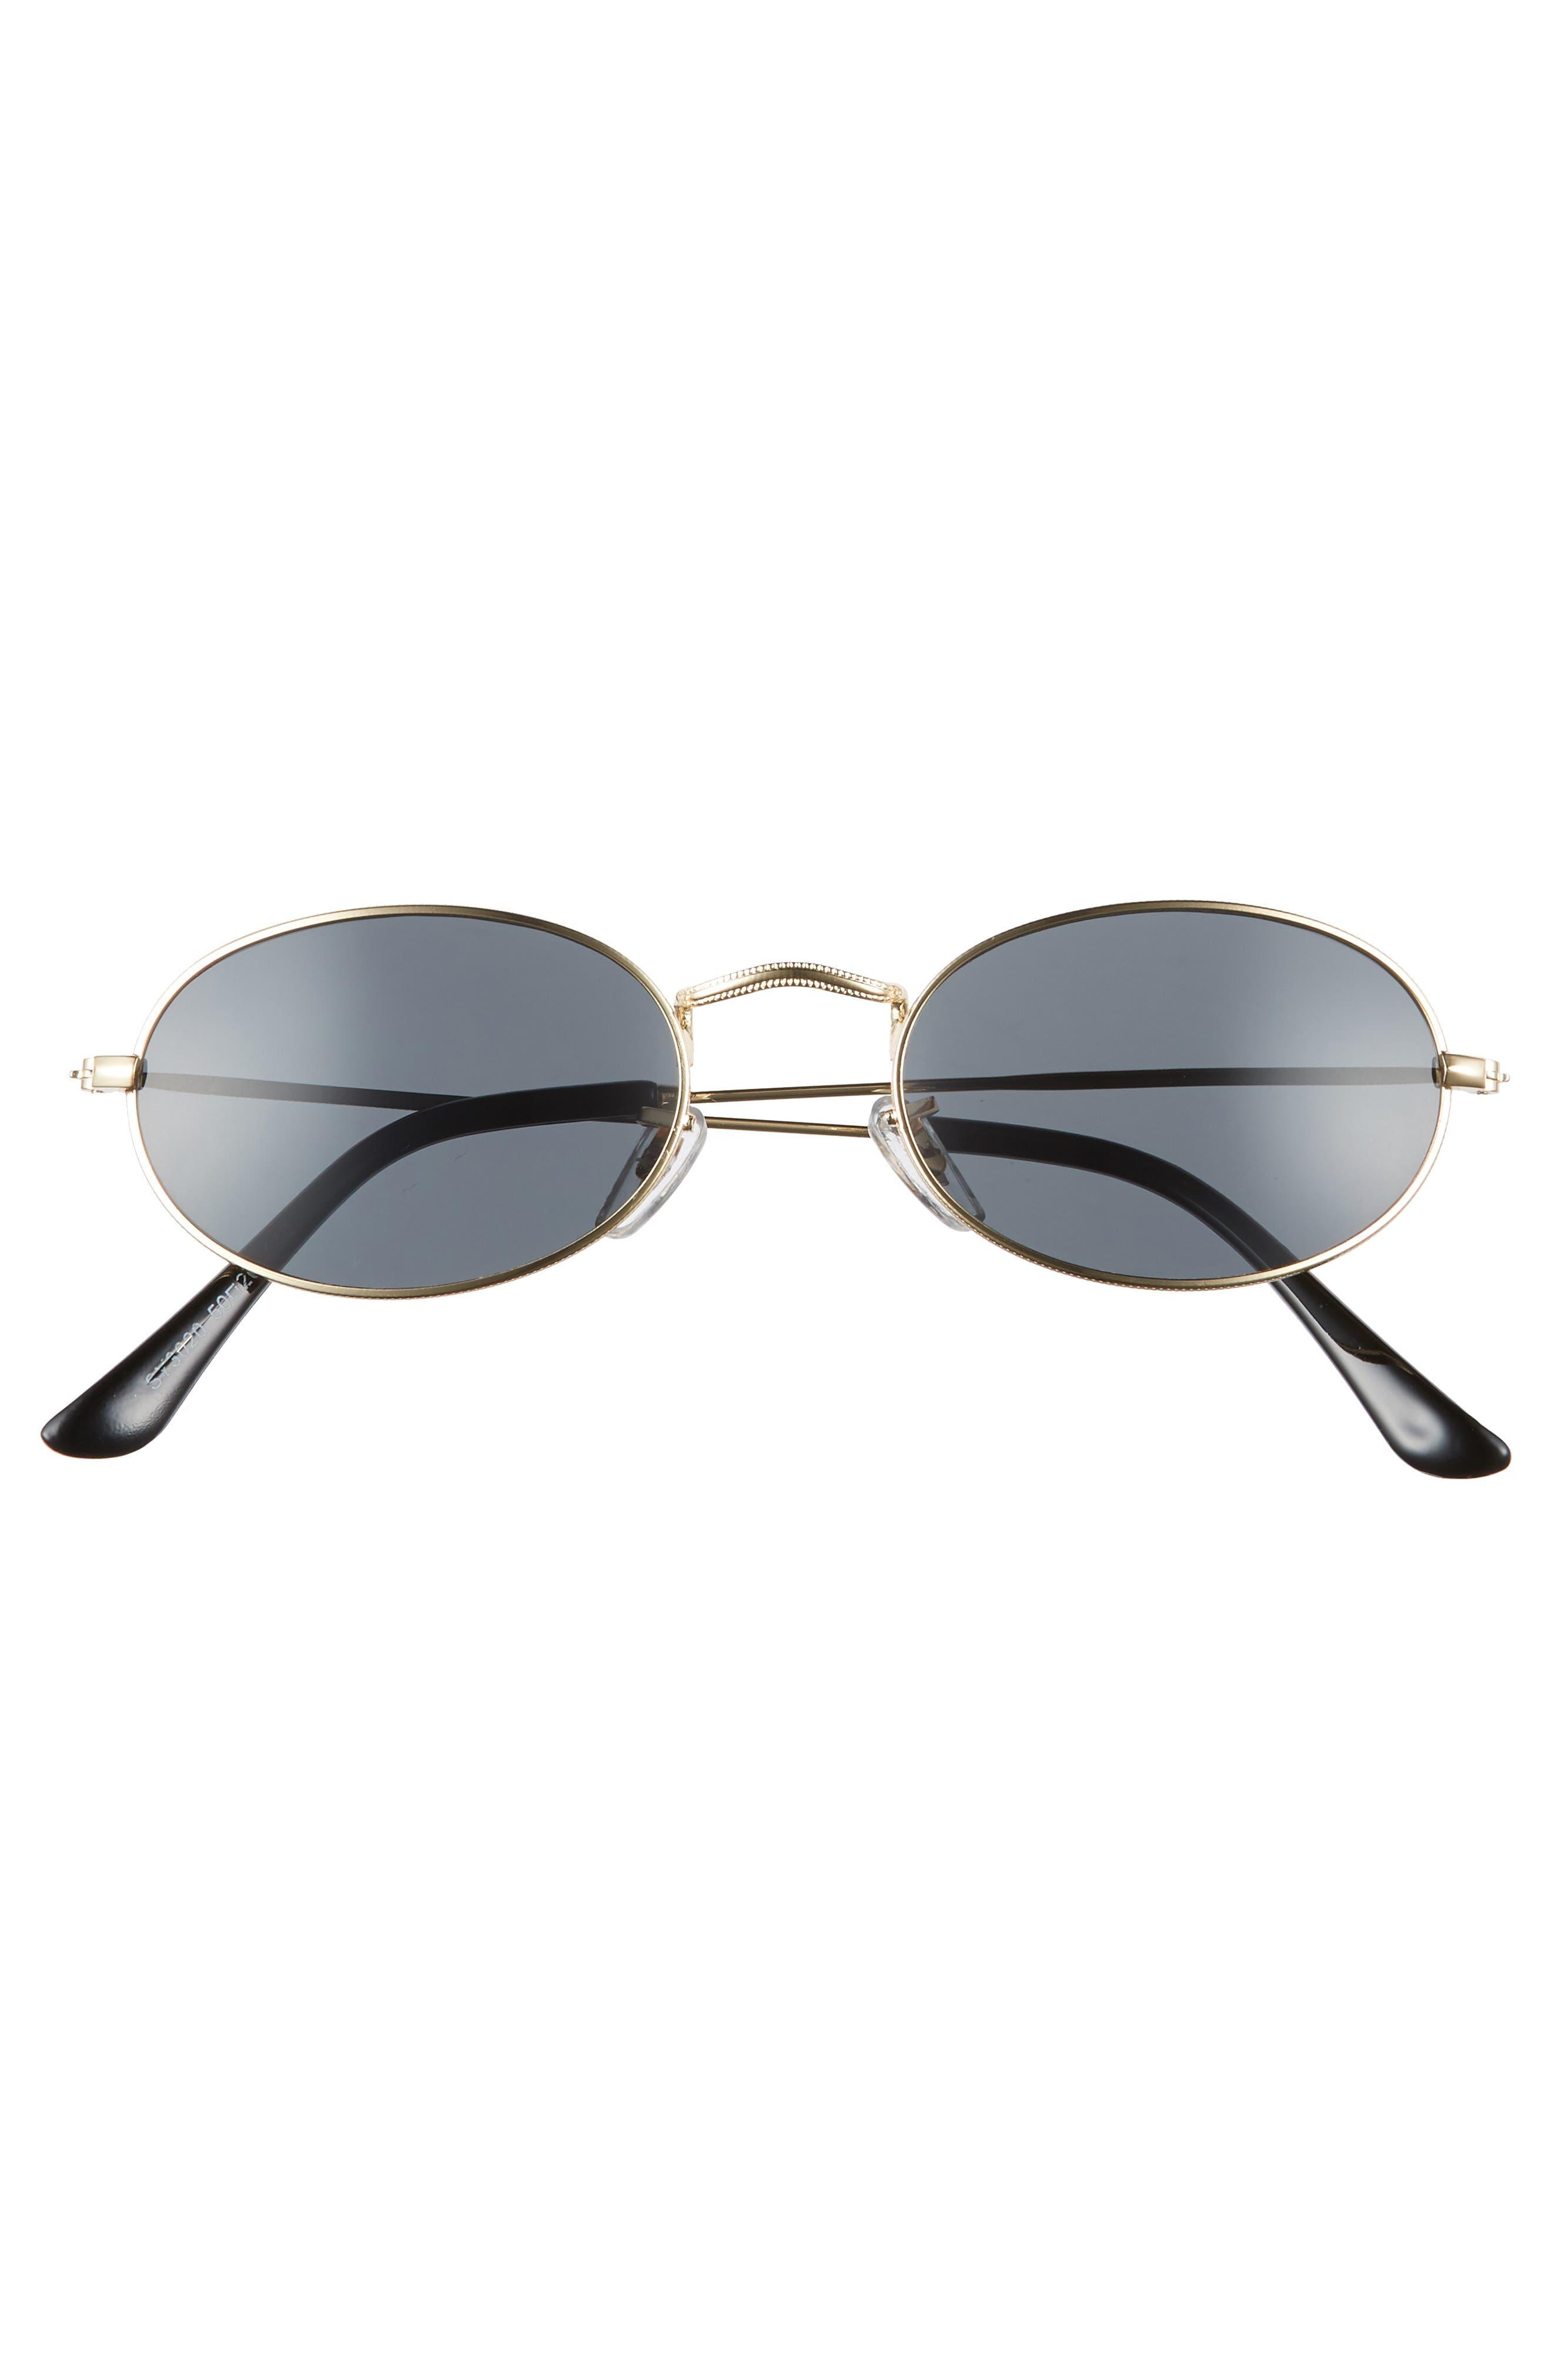 50mm Round Sunglasses,                             Alternate thumbnail 3, color,                             GOLD/ BLACK